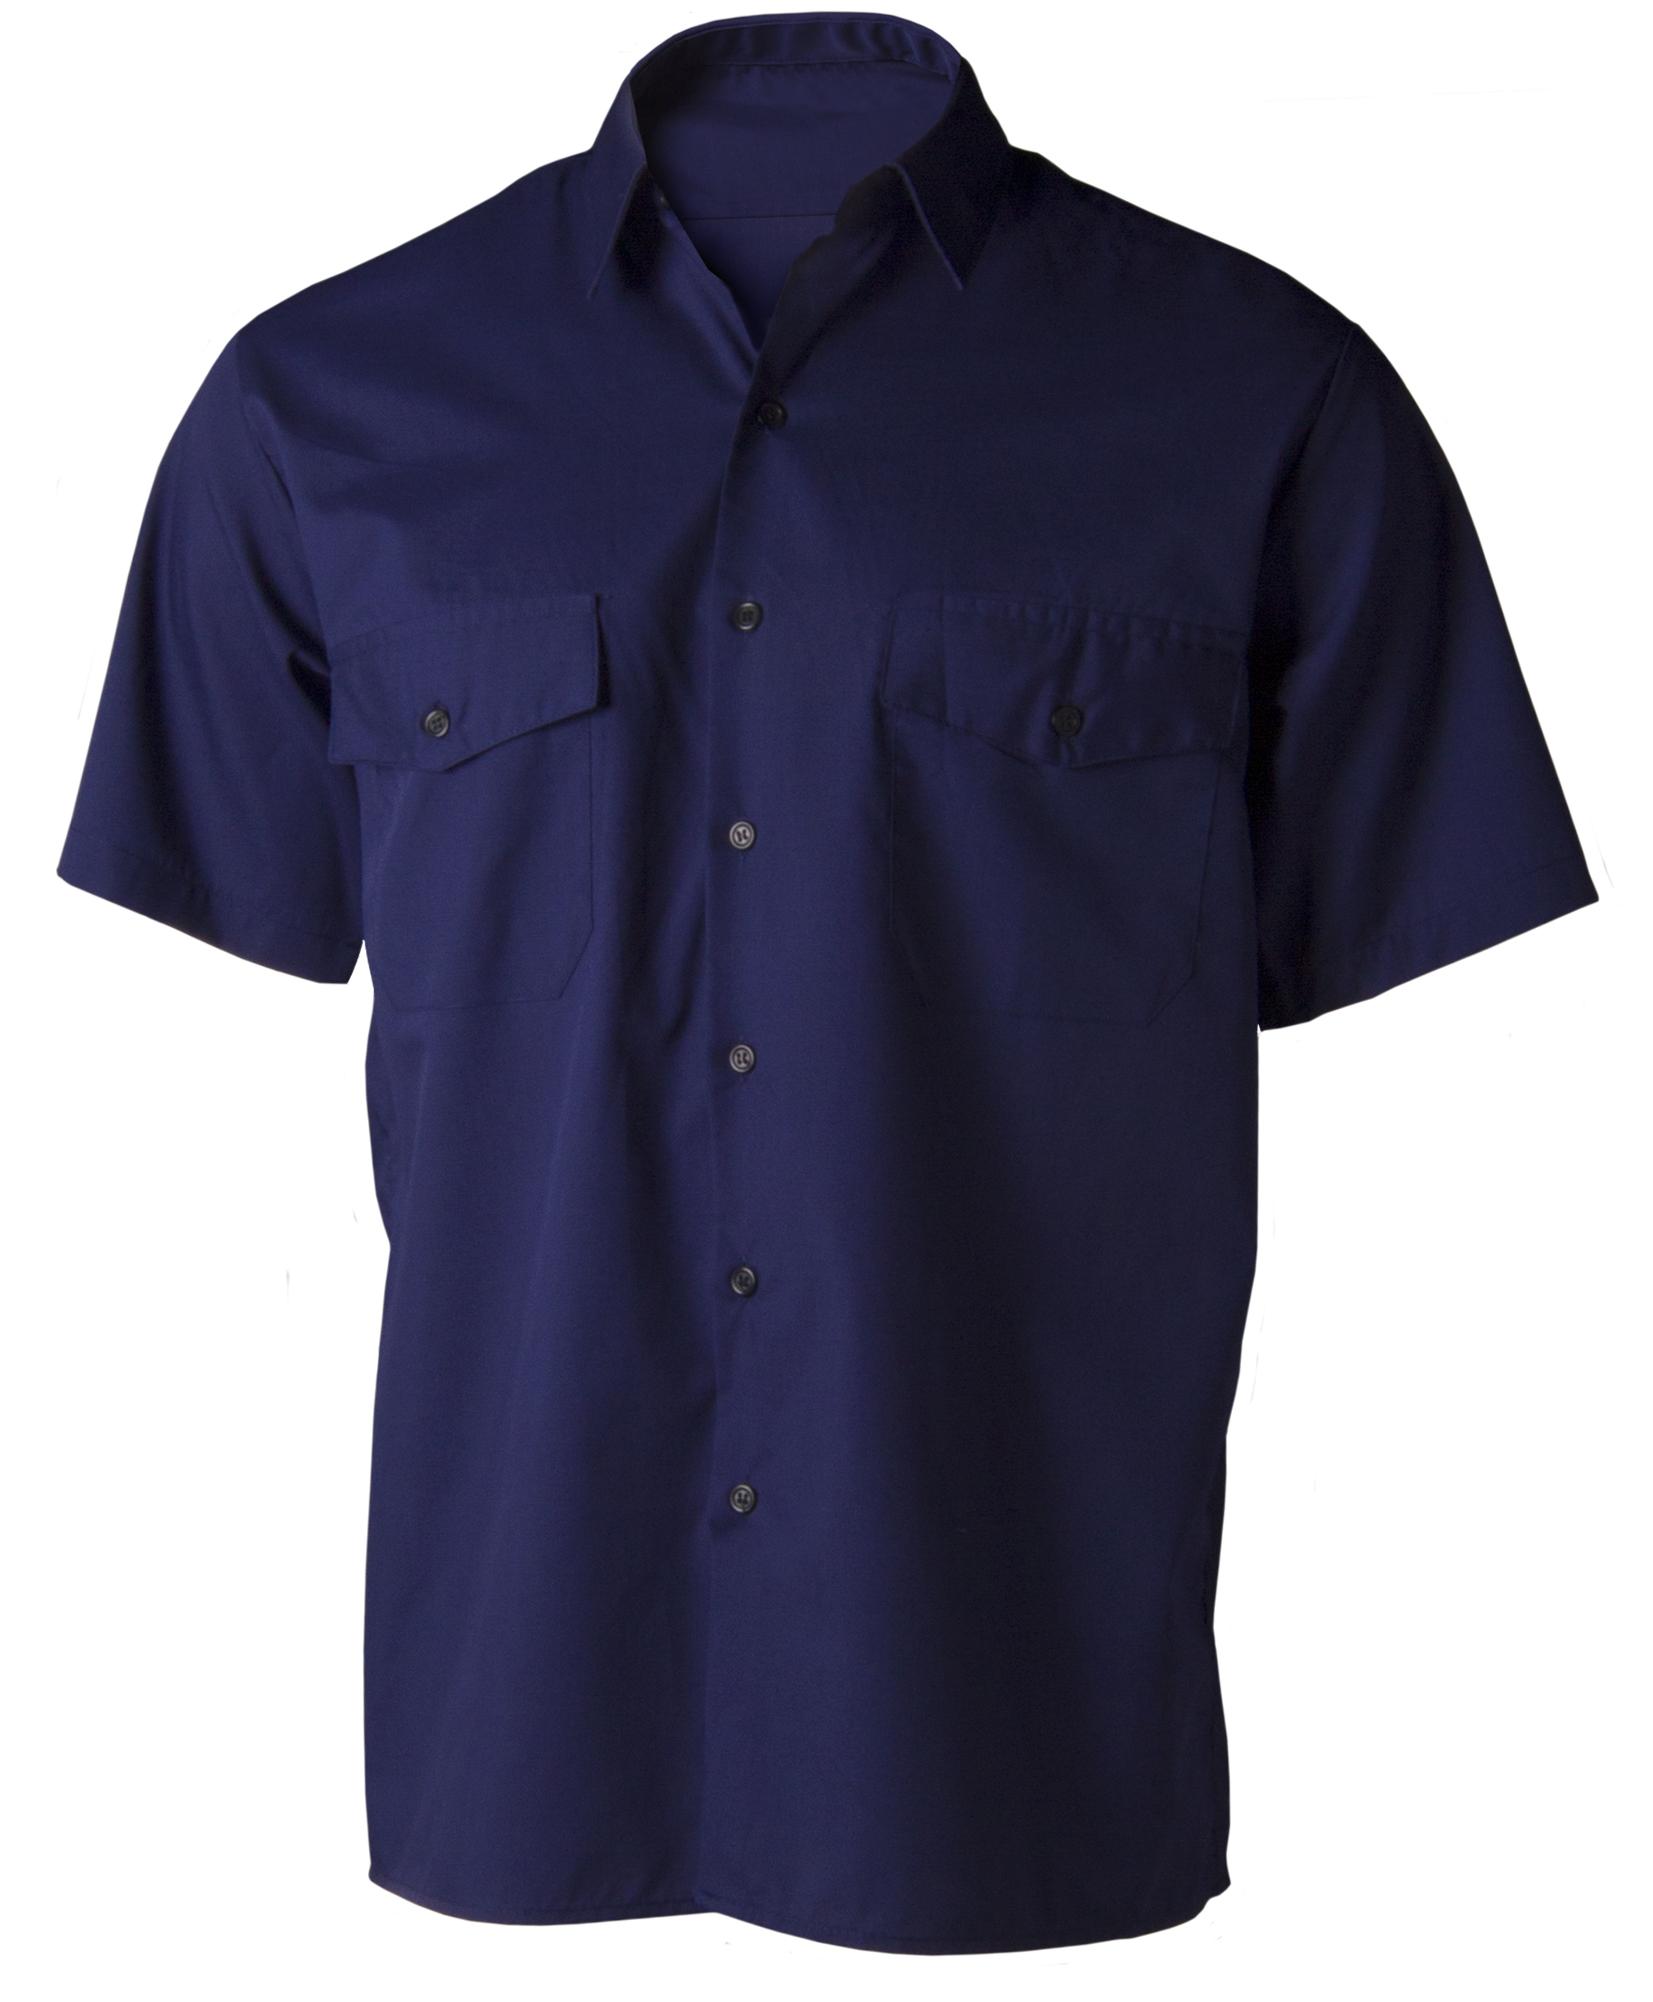 Camisa TKA fina manga corta Image